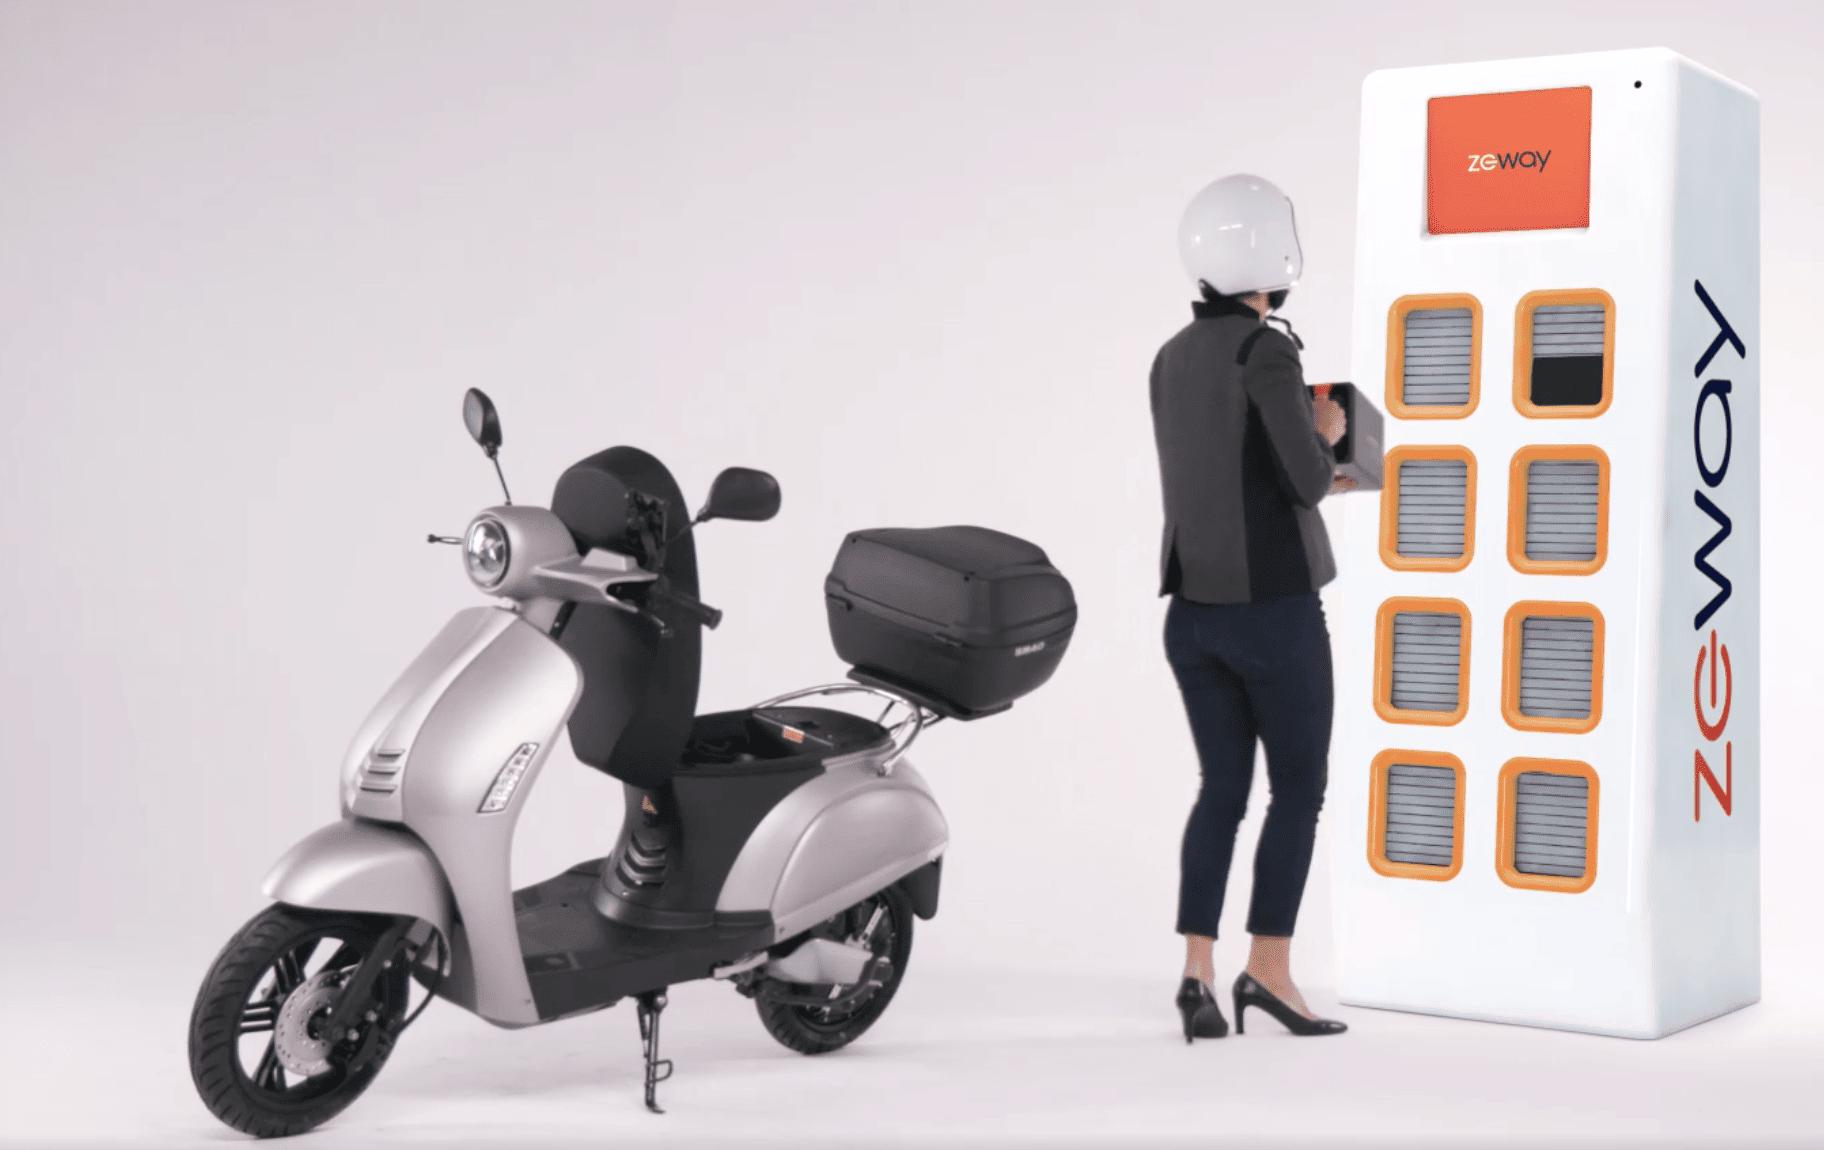 scooter zeway borne femme recharge